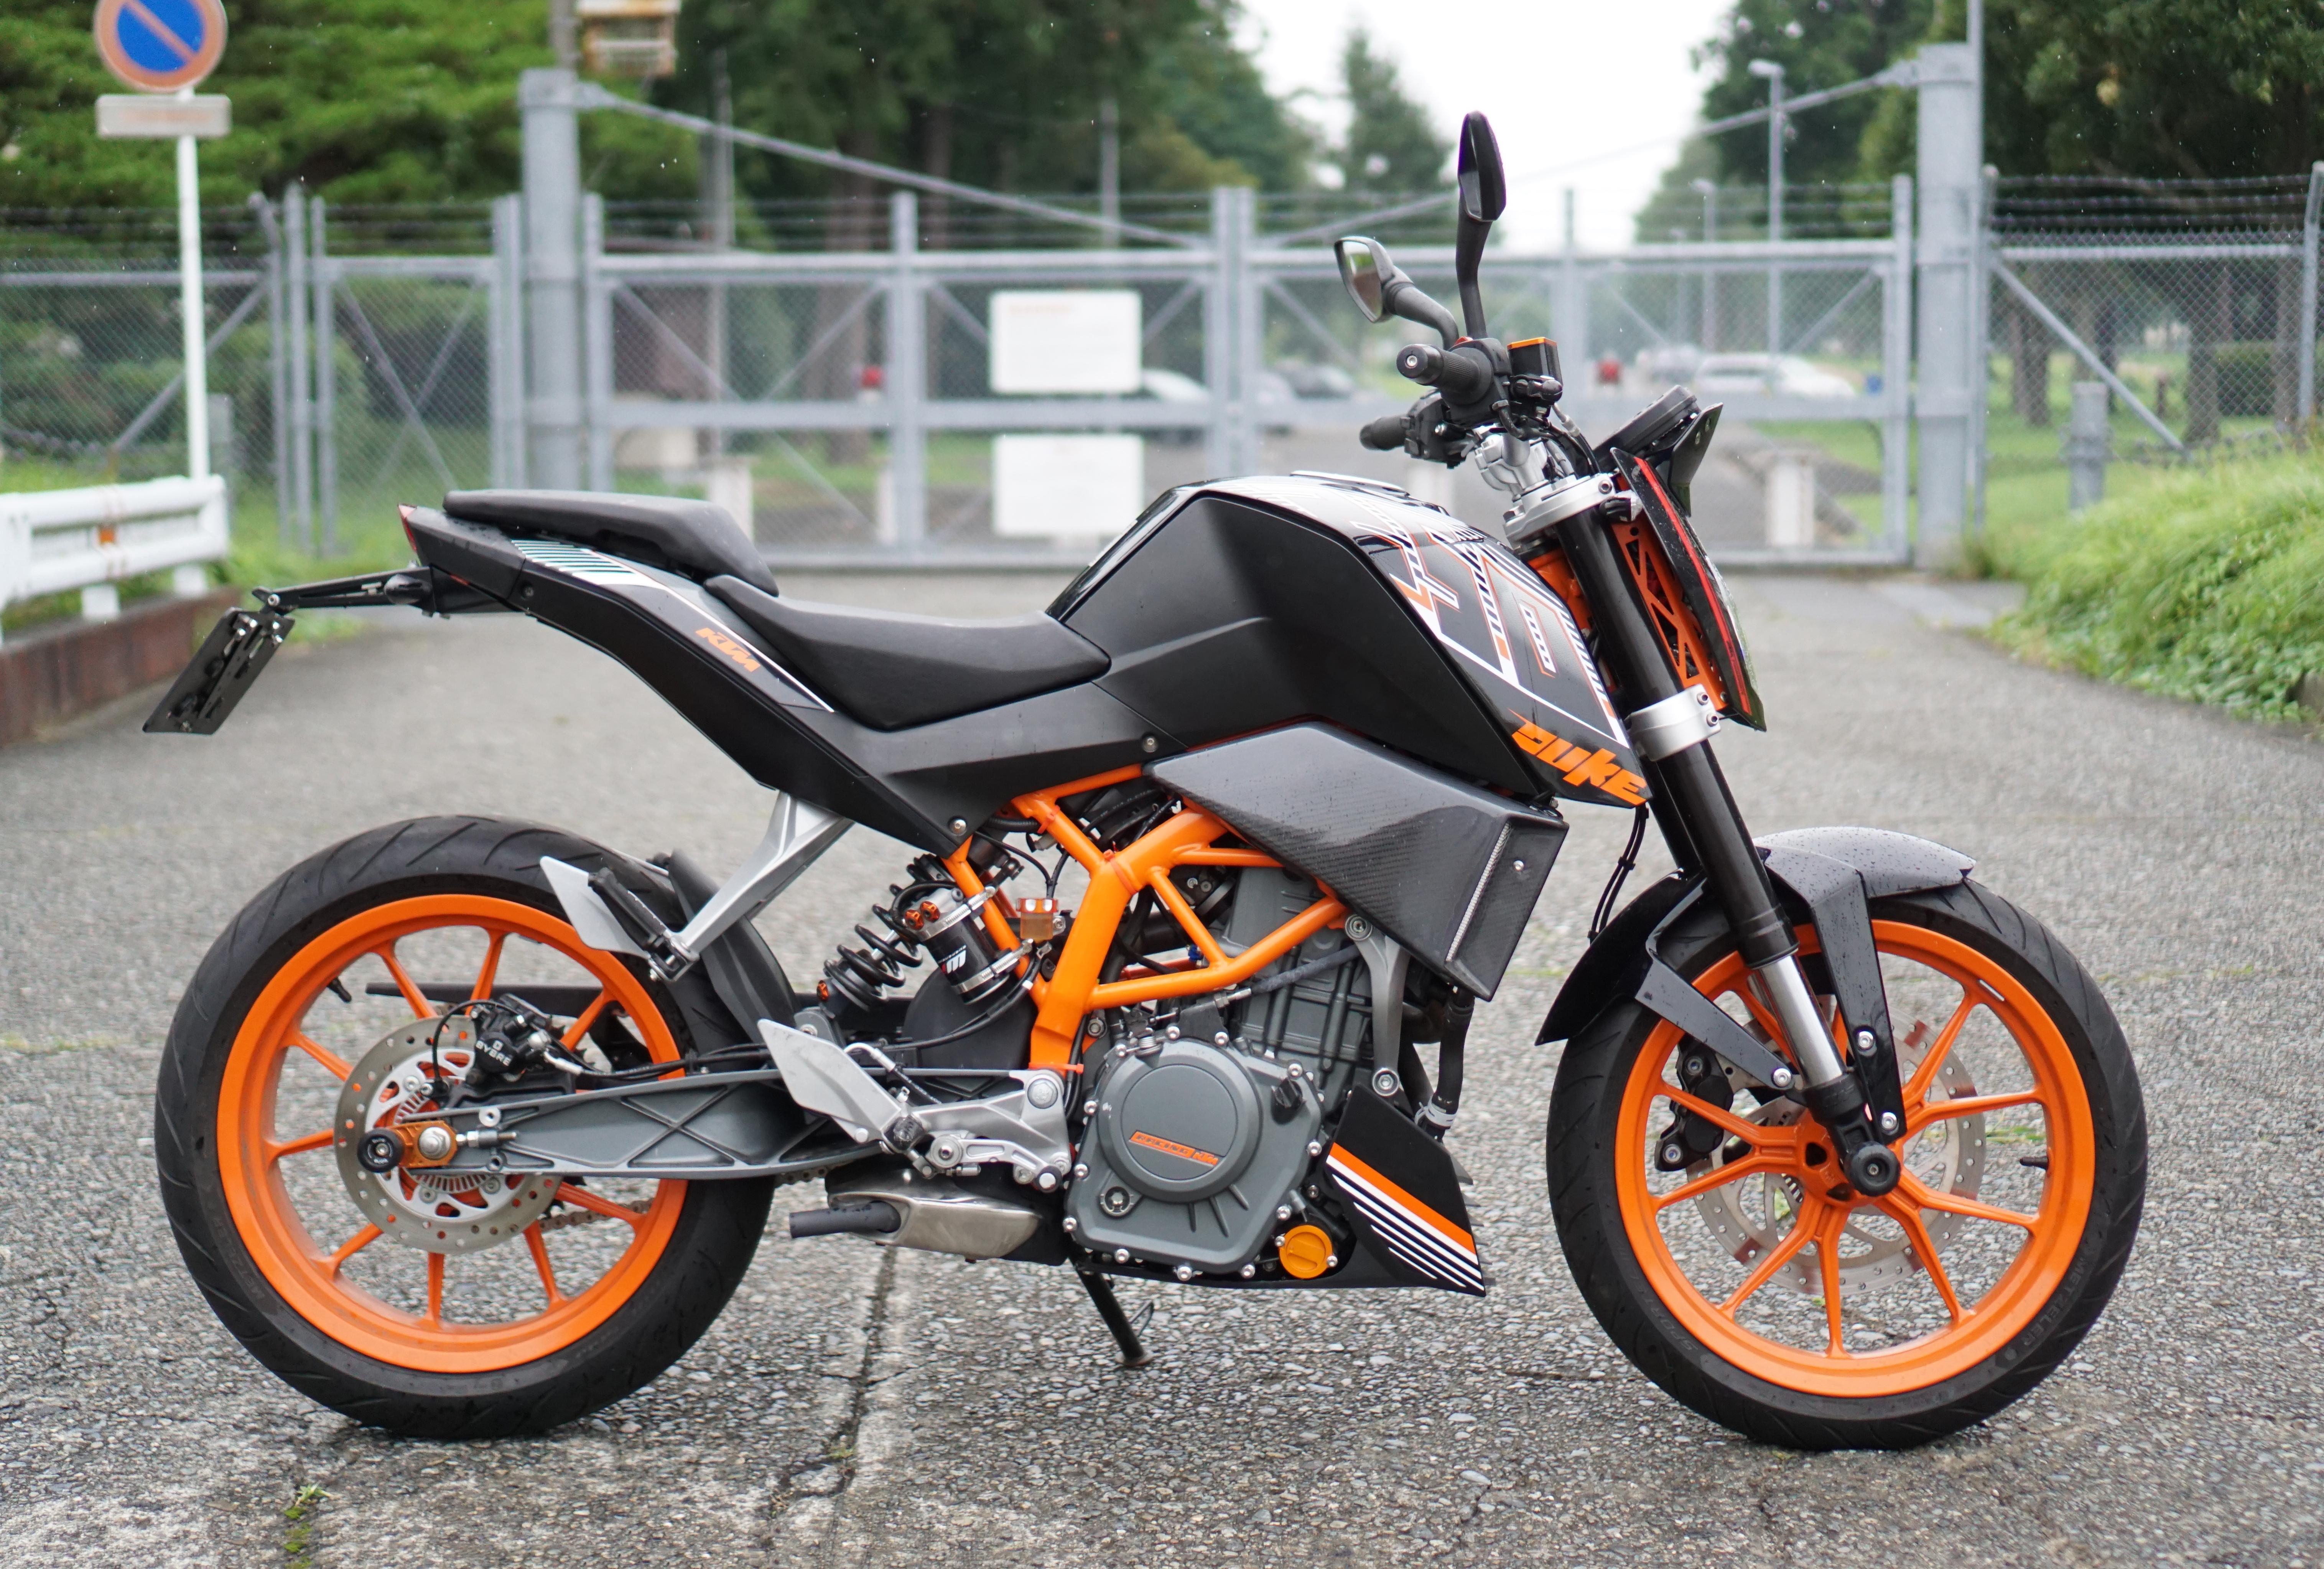 250DUKE(SH-105)チ-2号 - 【公式】レンタルバイクのベストBike® 町田駅前